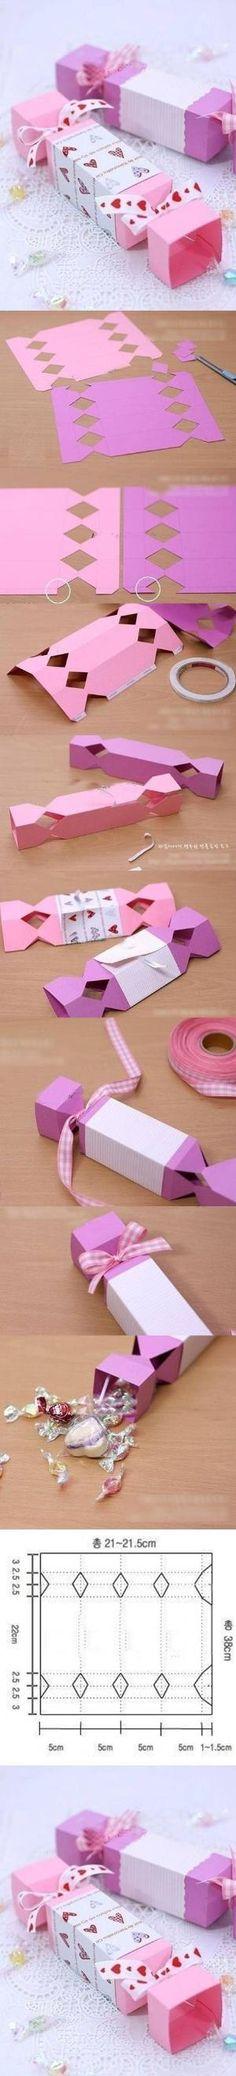 DIY Cute Candy Gift Box